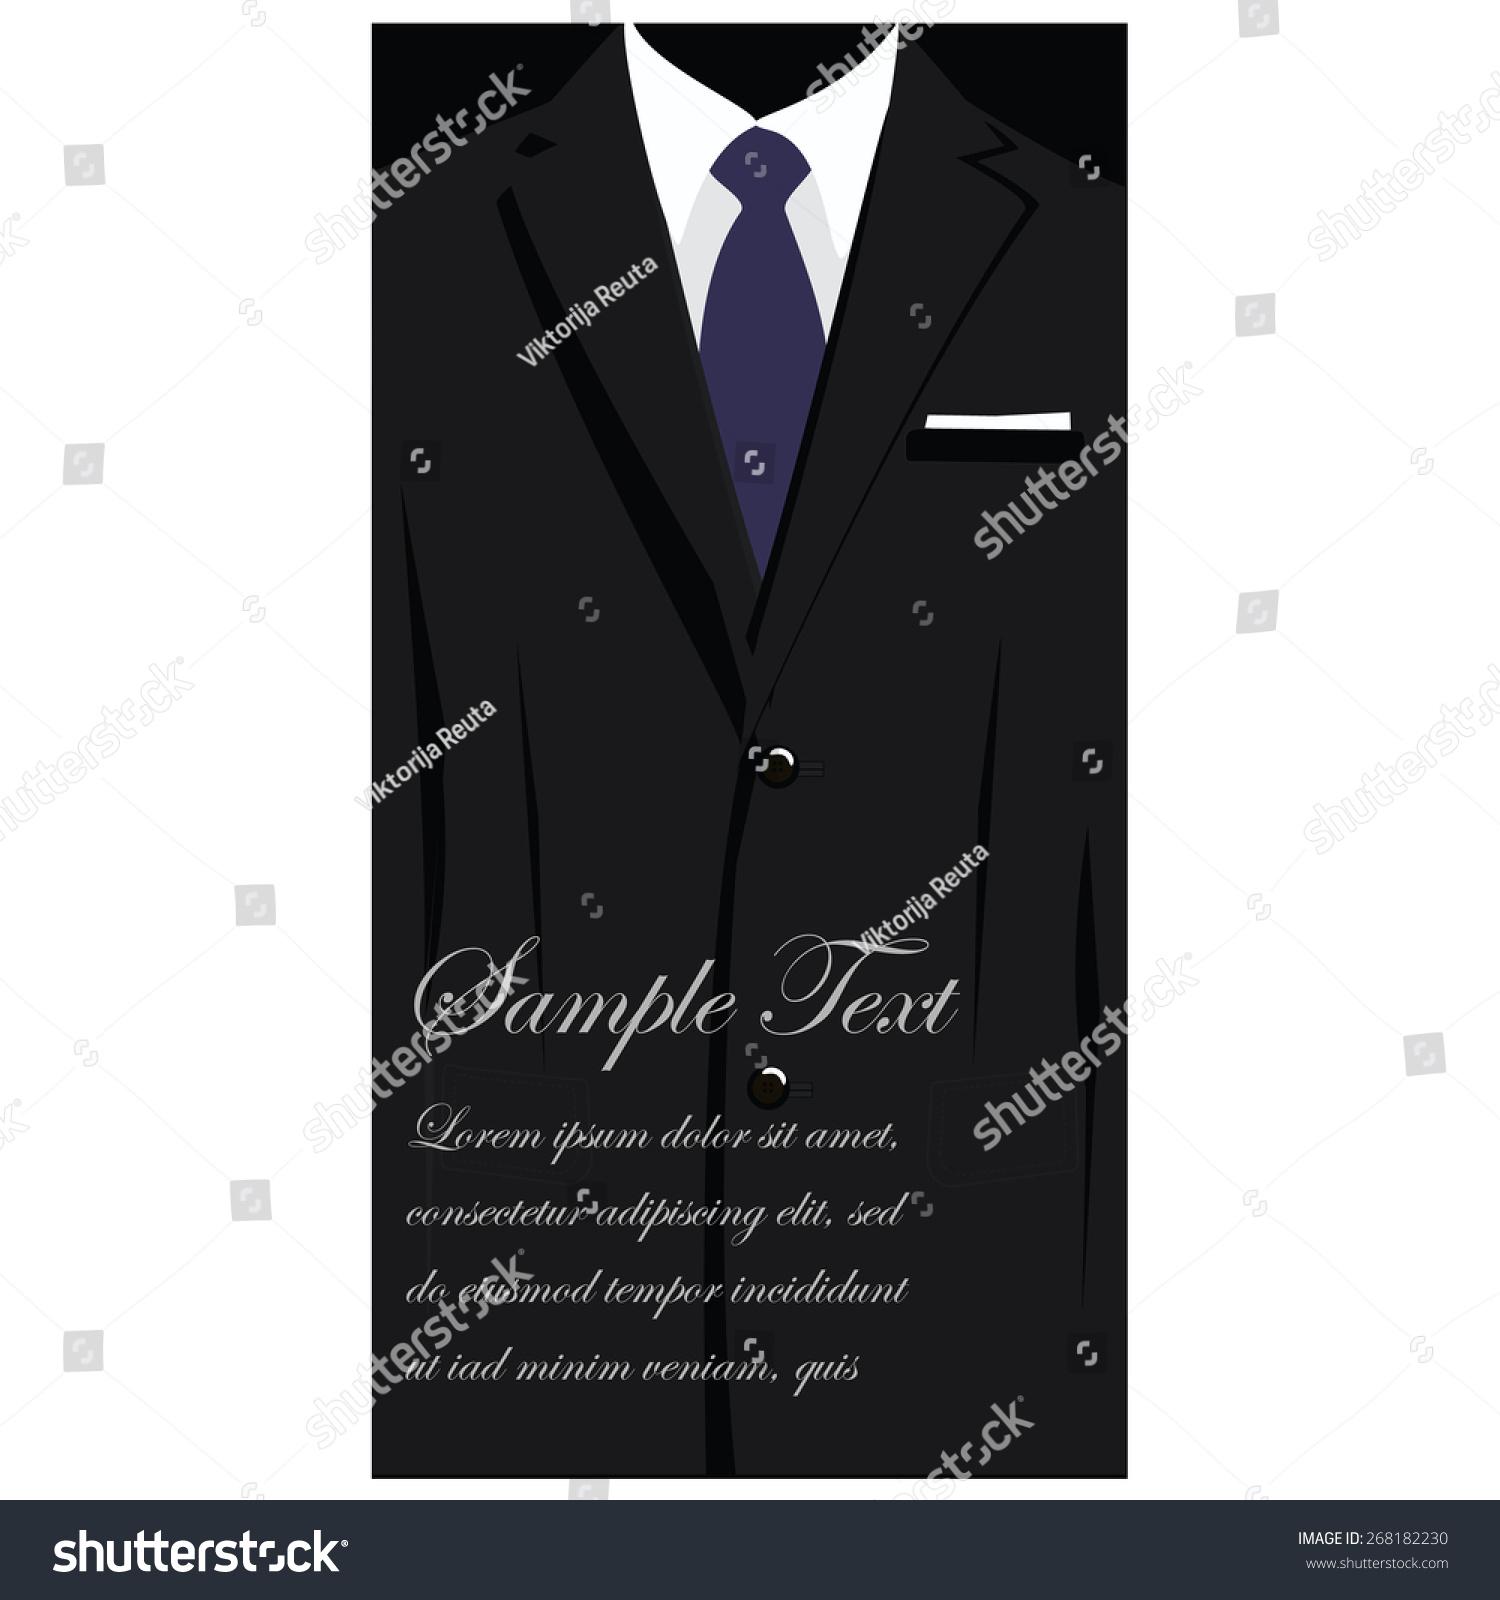 Vector Business Cards Elegant Suit Blue Stock Vector 268182230 ...